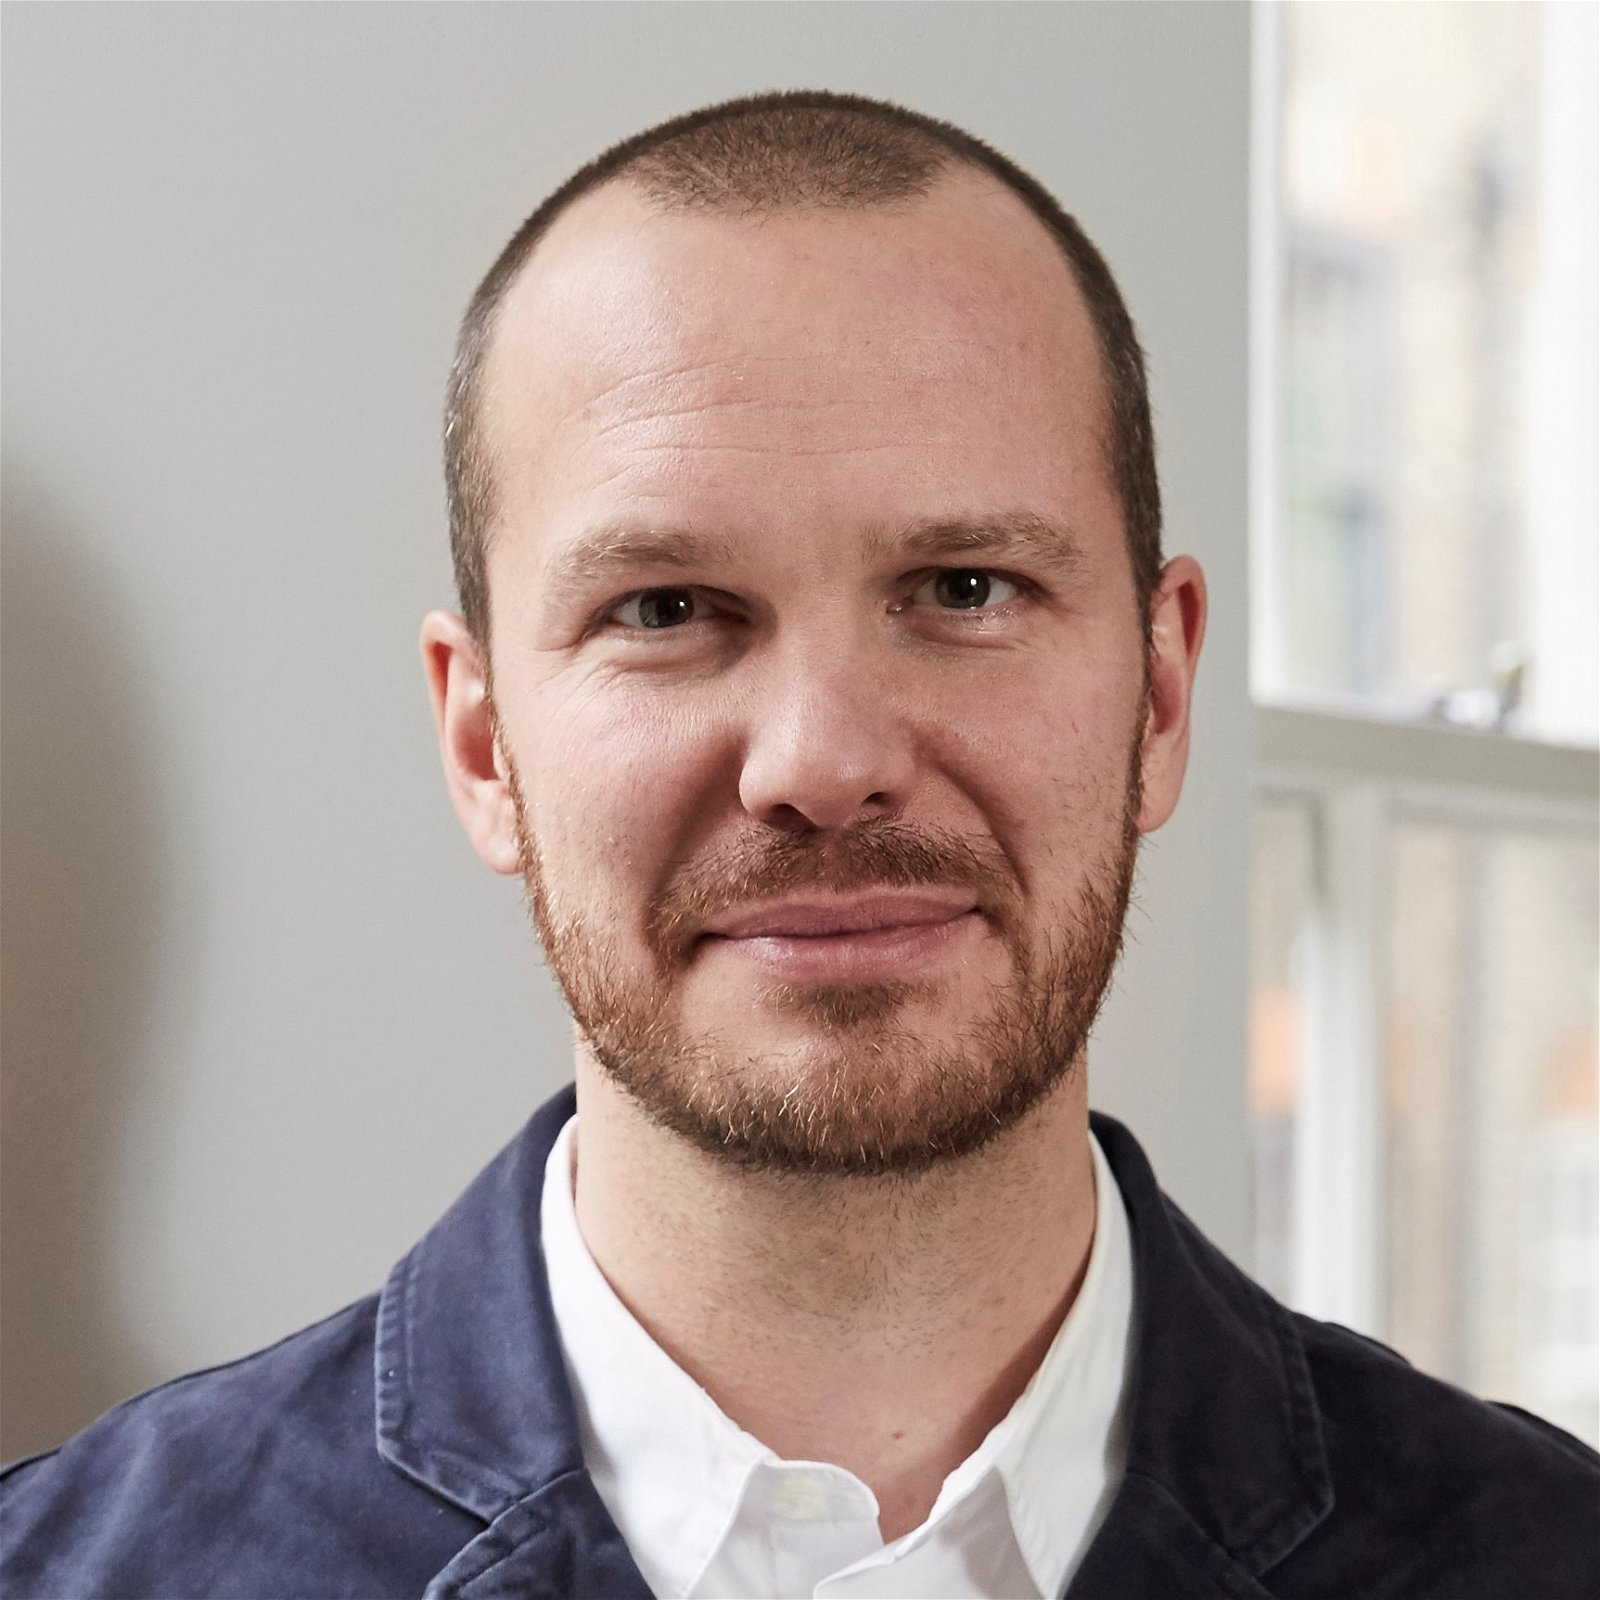 Tom-Savigar-consumer-future-trends-expert-at-Great-British-Speakers